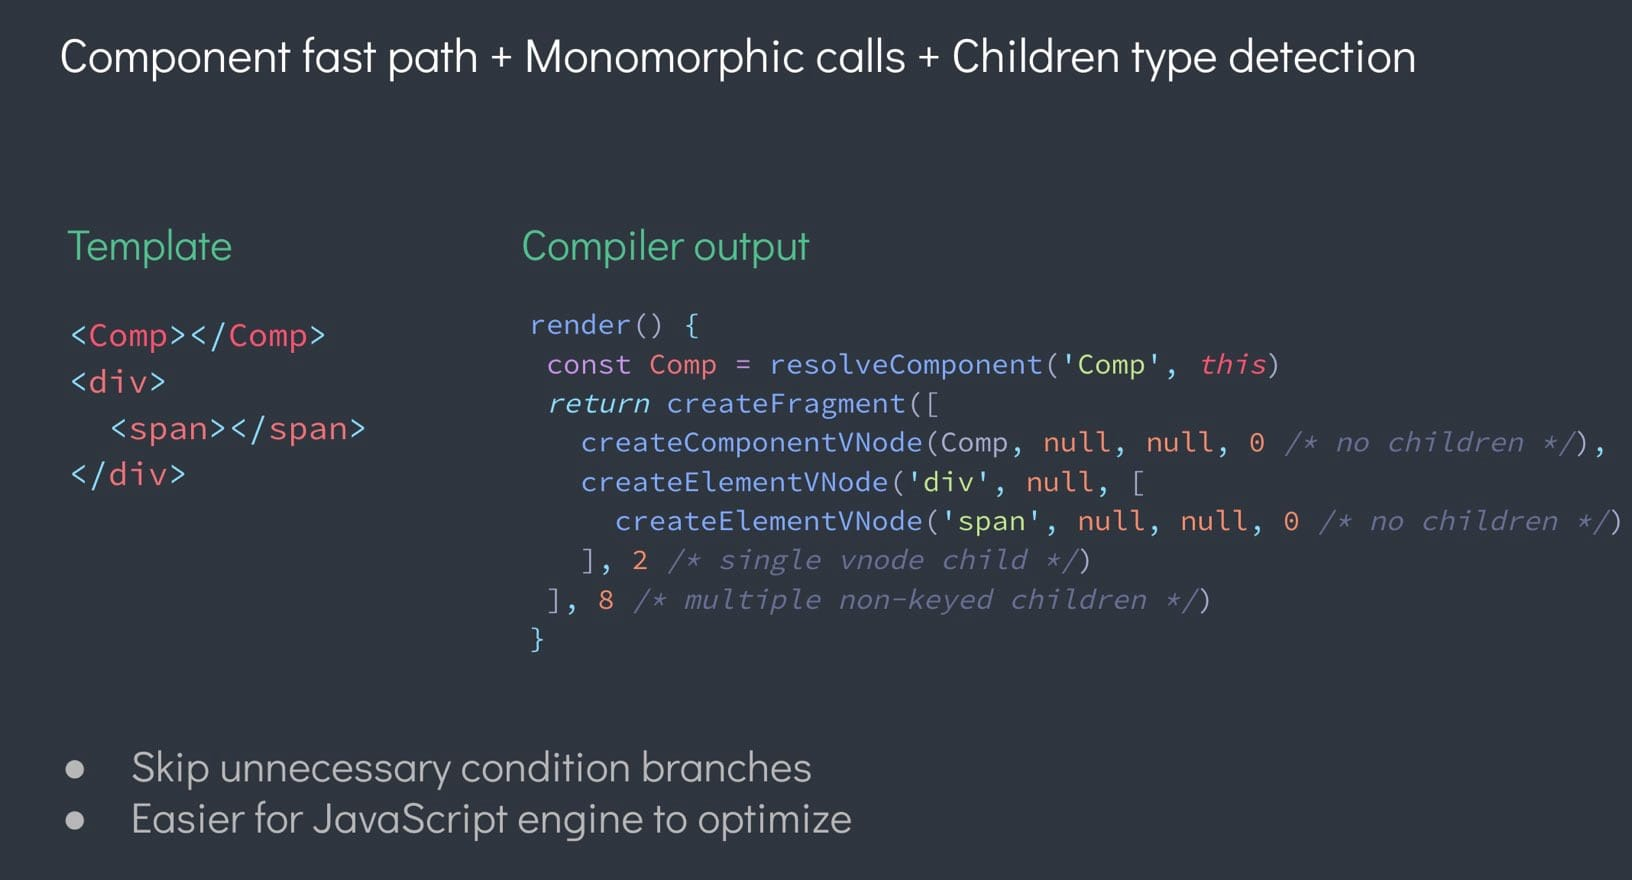 Component fast path in Vue.js development